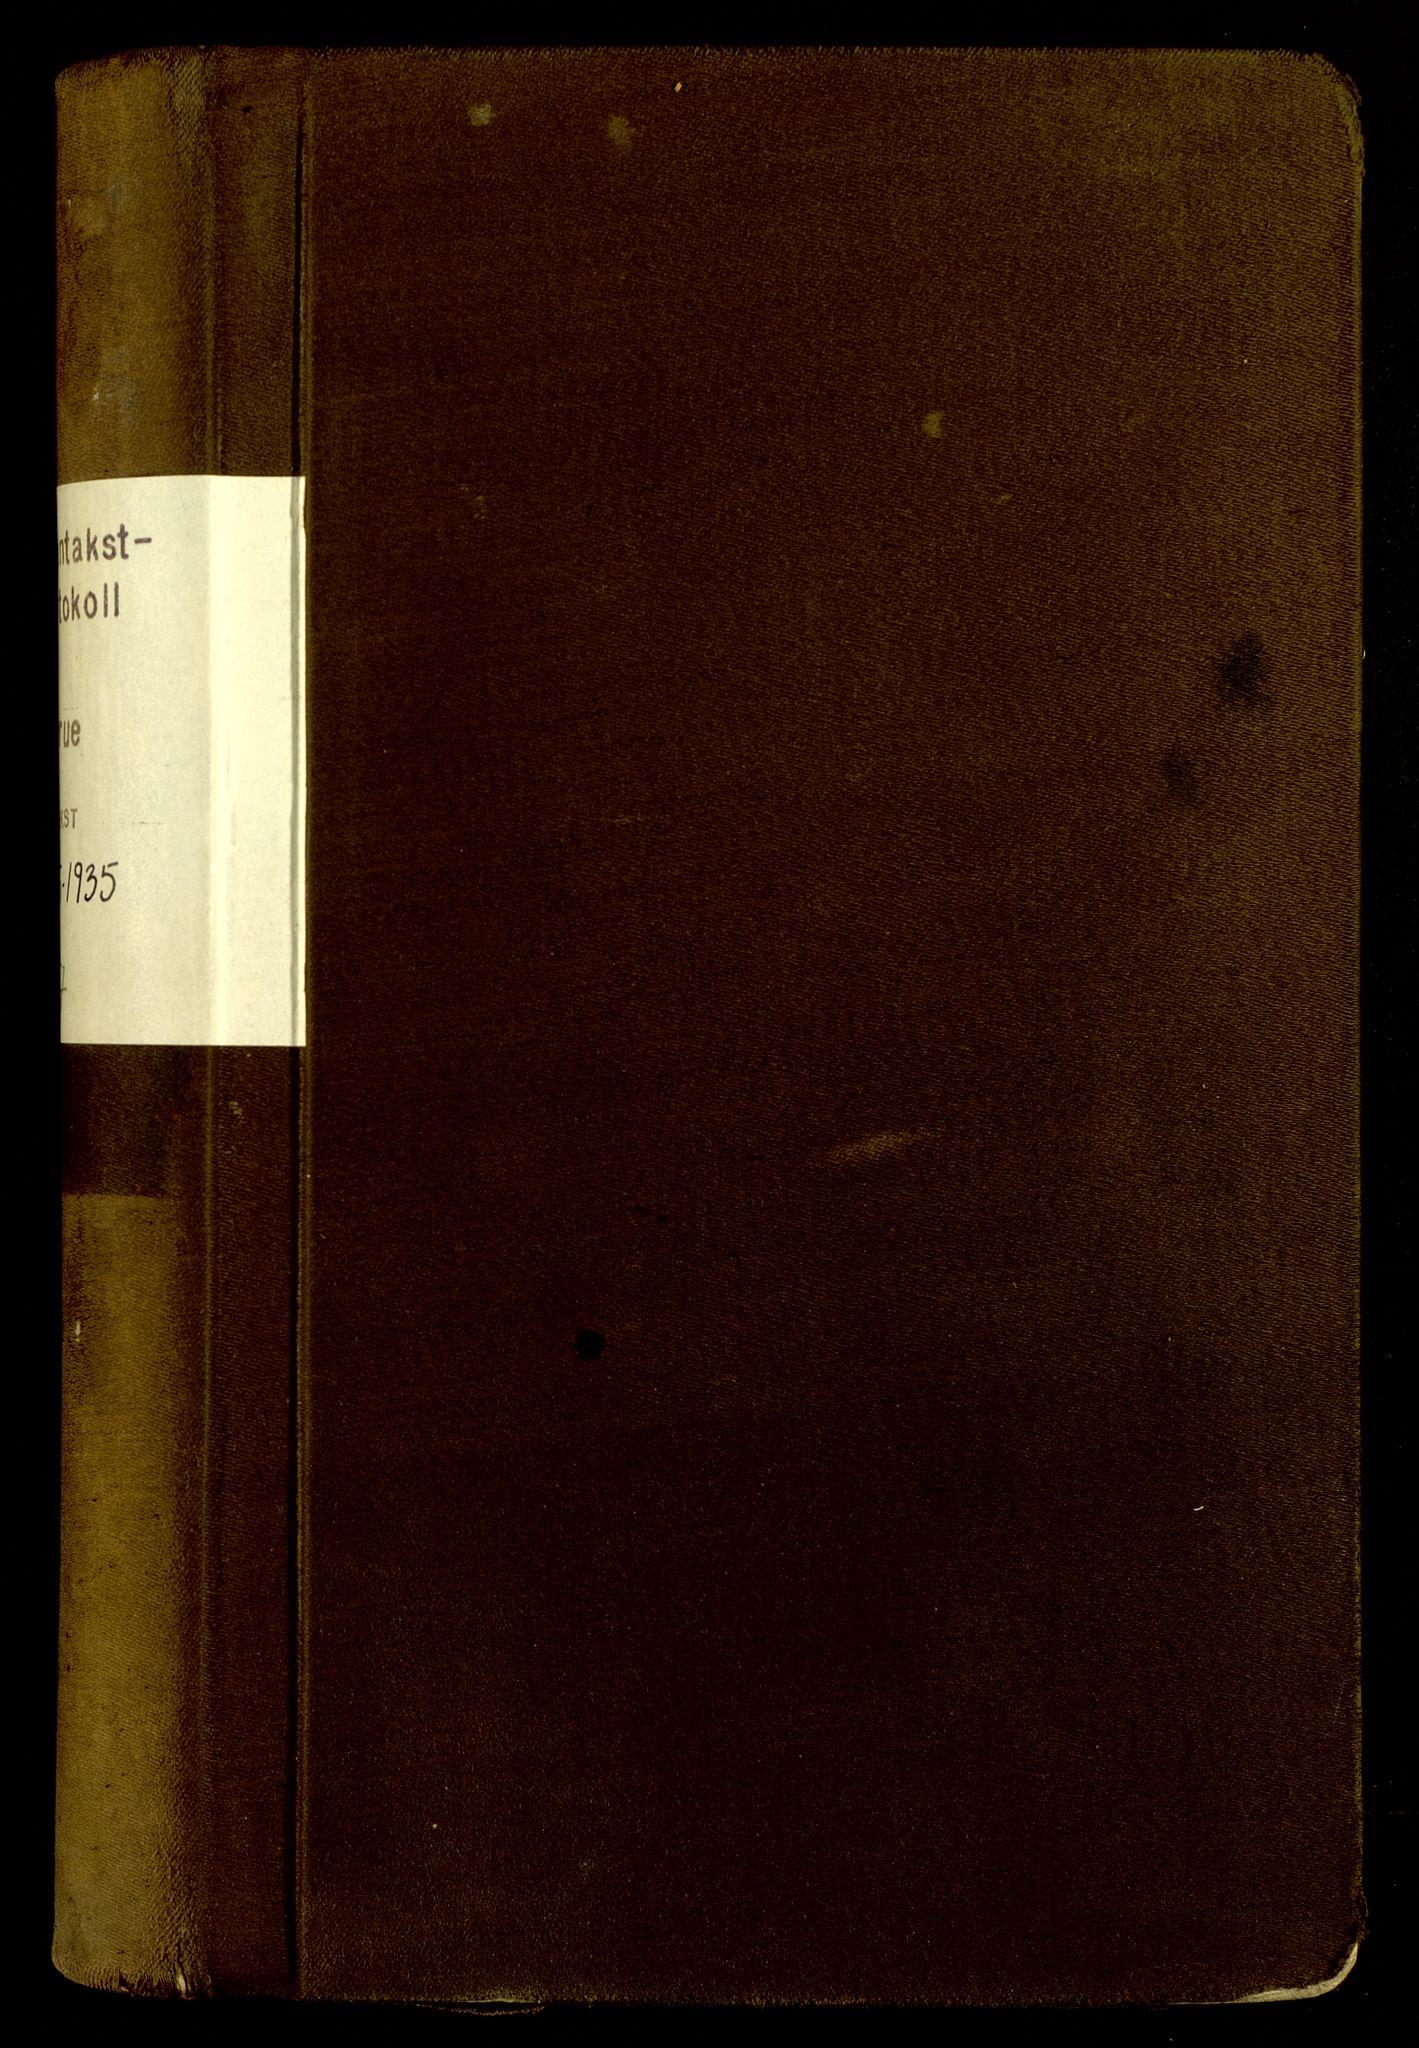 SAH, Norges Brannkasse, Grue, F/L0007: Branntakstprotokoll, 1925-1935